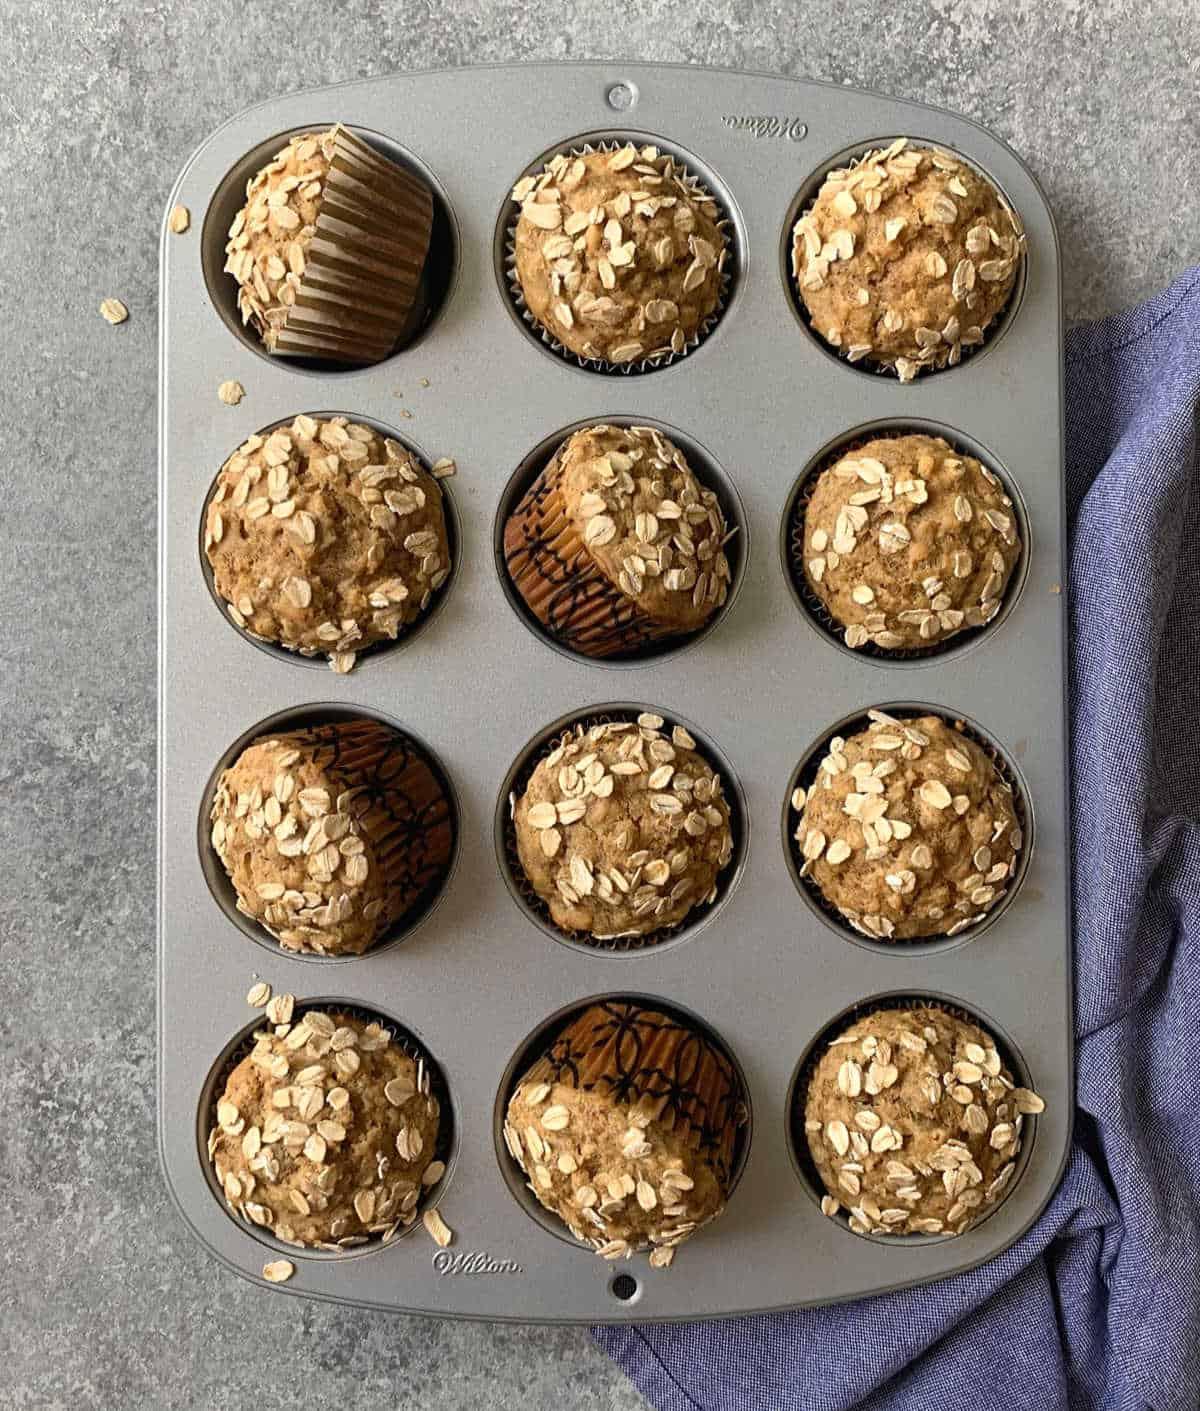 Vegan banana muffins baked in a cupcake pan